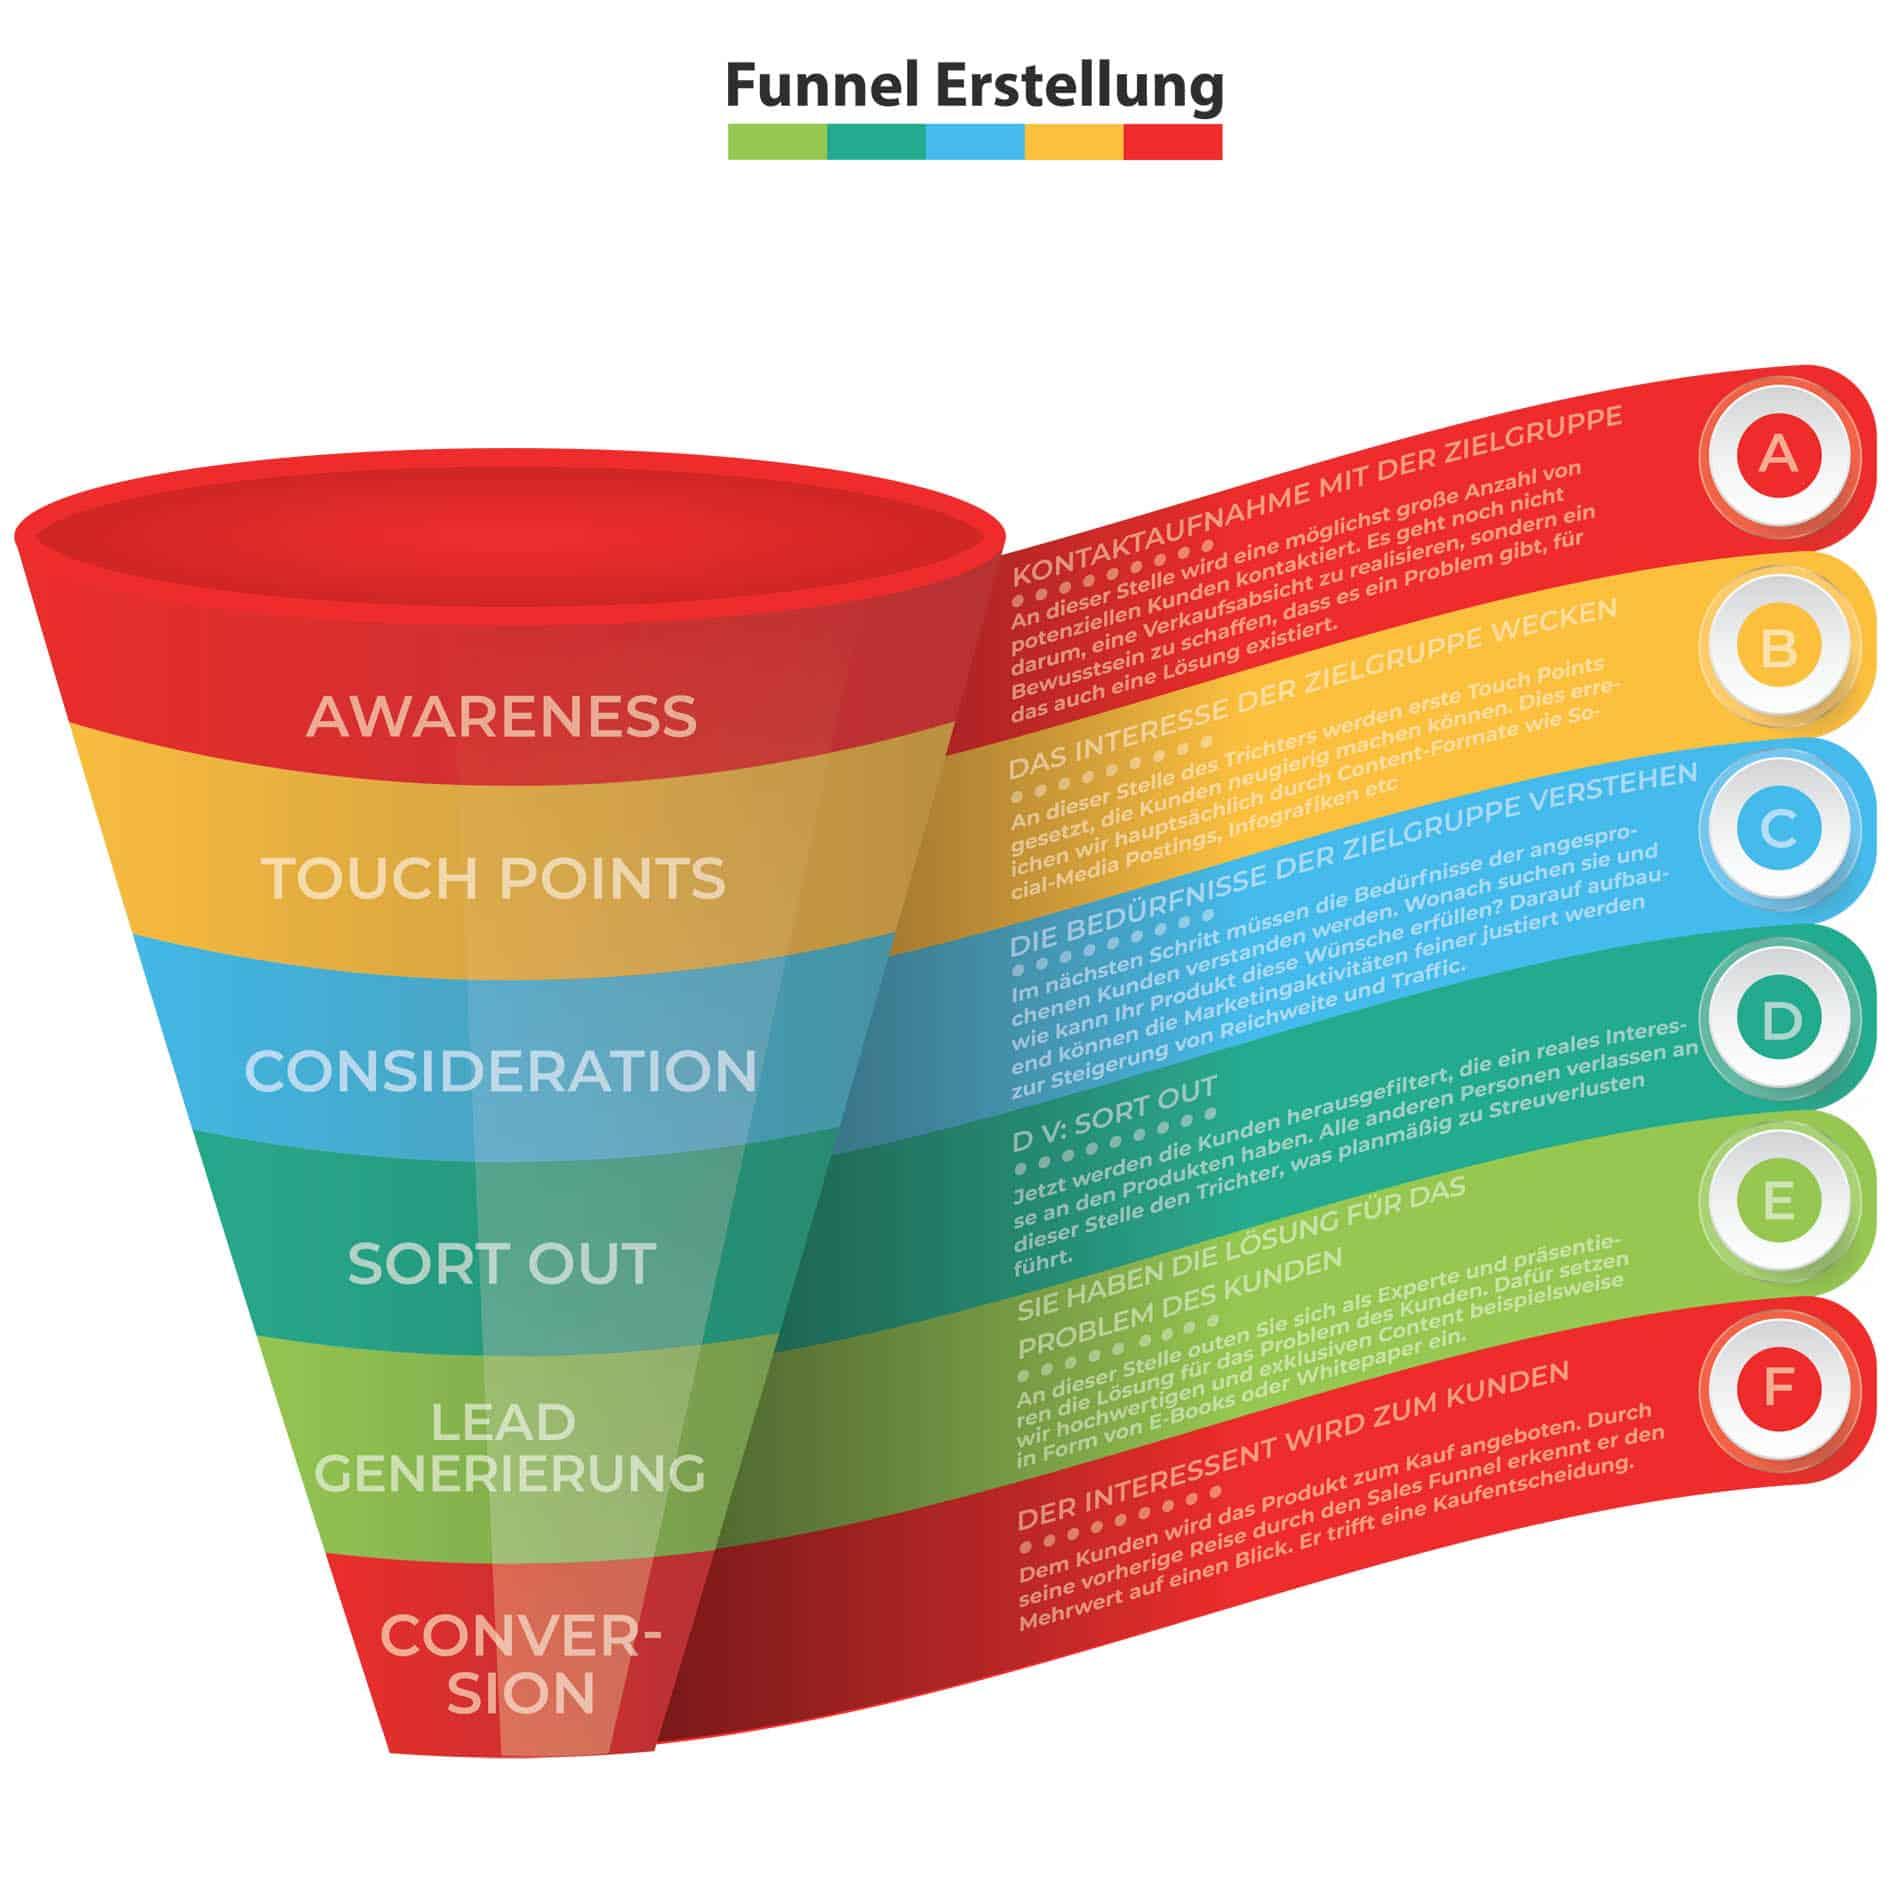 funnel erstellung info